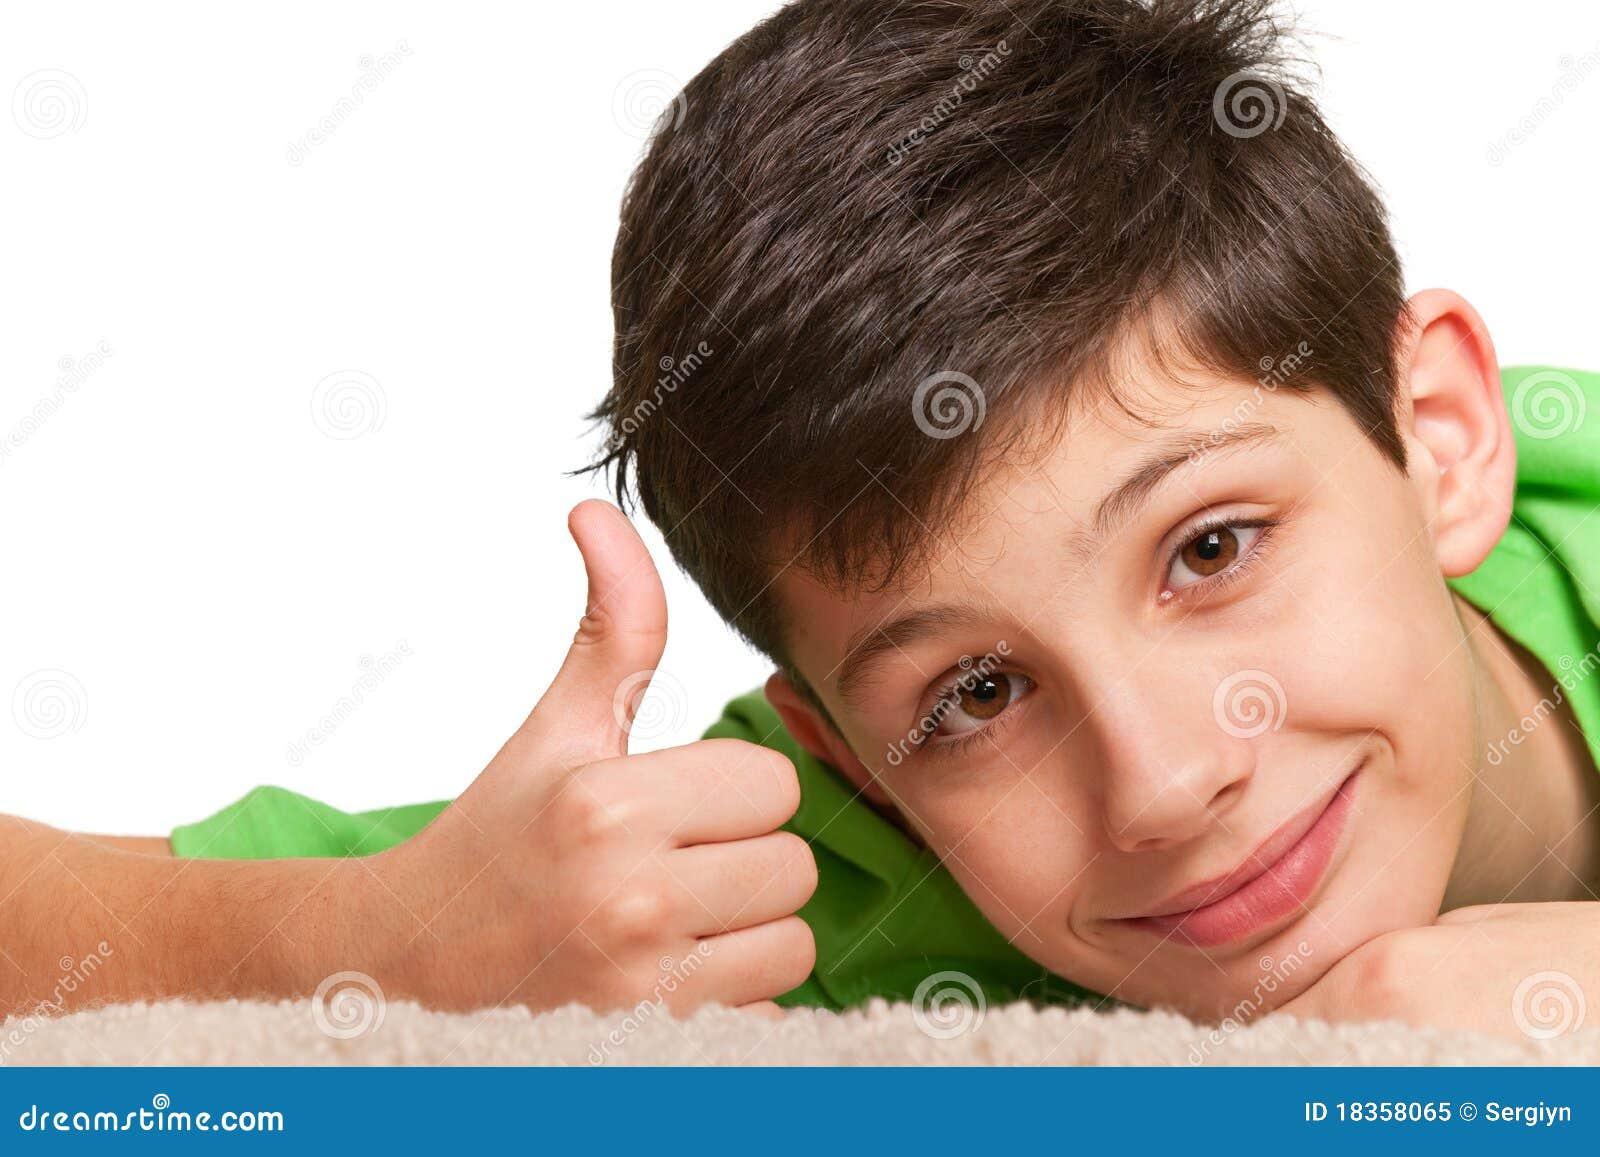 Sly Look Of Happy Boy Royalty Free Stock Photo Image